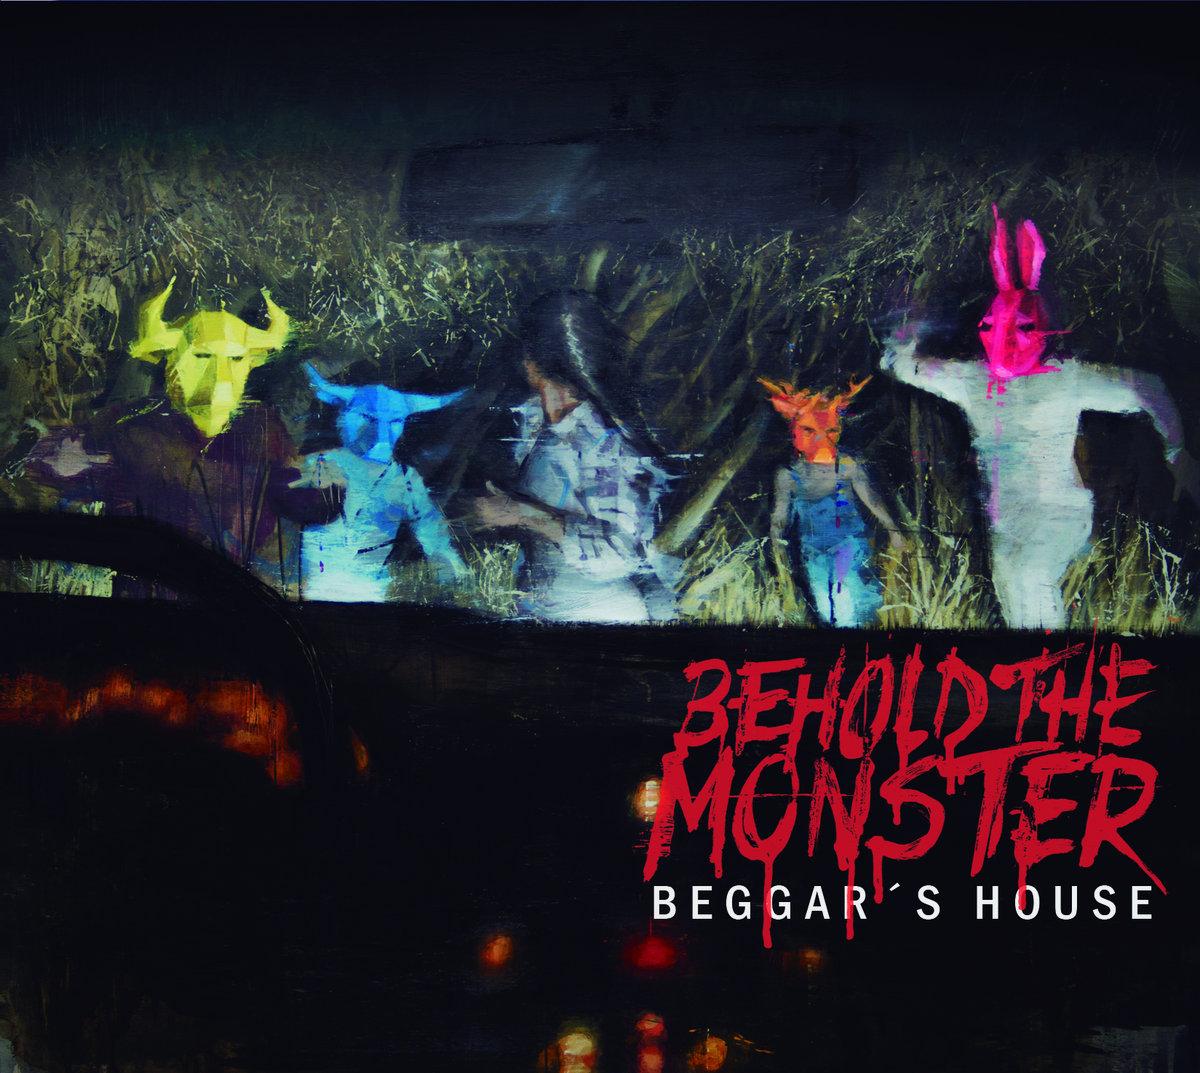 Beggar's House - Behold the monster A4010969679_10